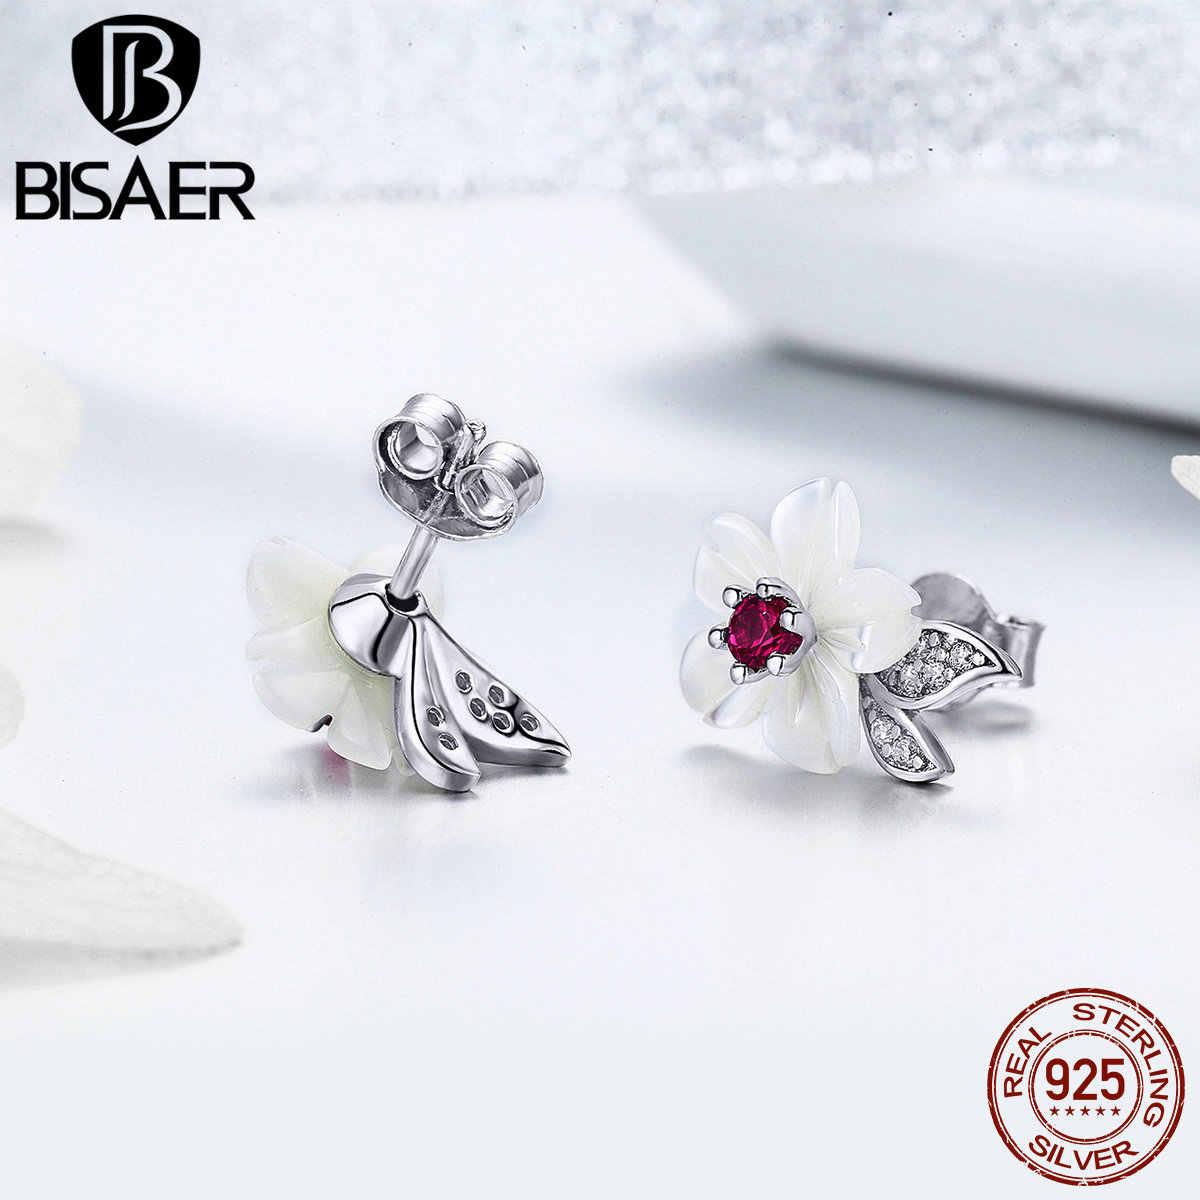 BISAER 925 הכסף Blooming מעטפת פרח עגילי סחלב פרח קטן נשים עגילי סטרלינג כסף תכשיטי EFE055